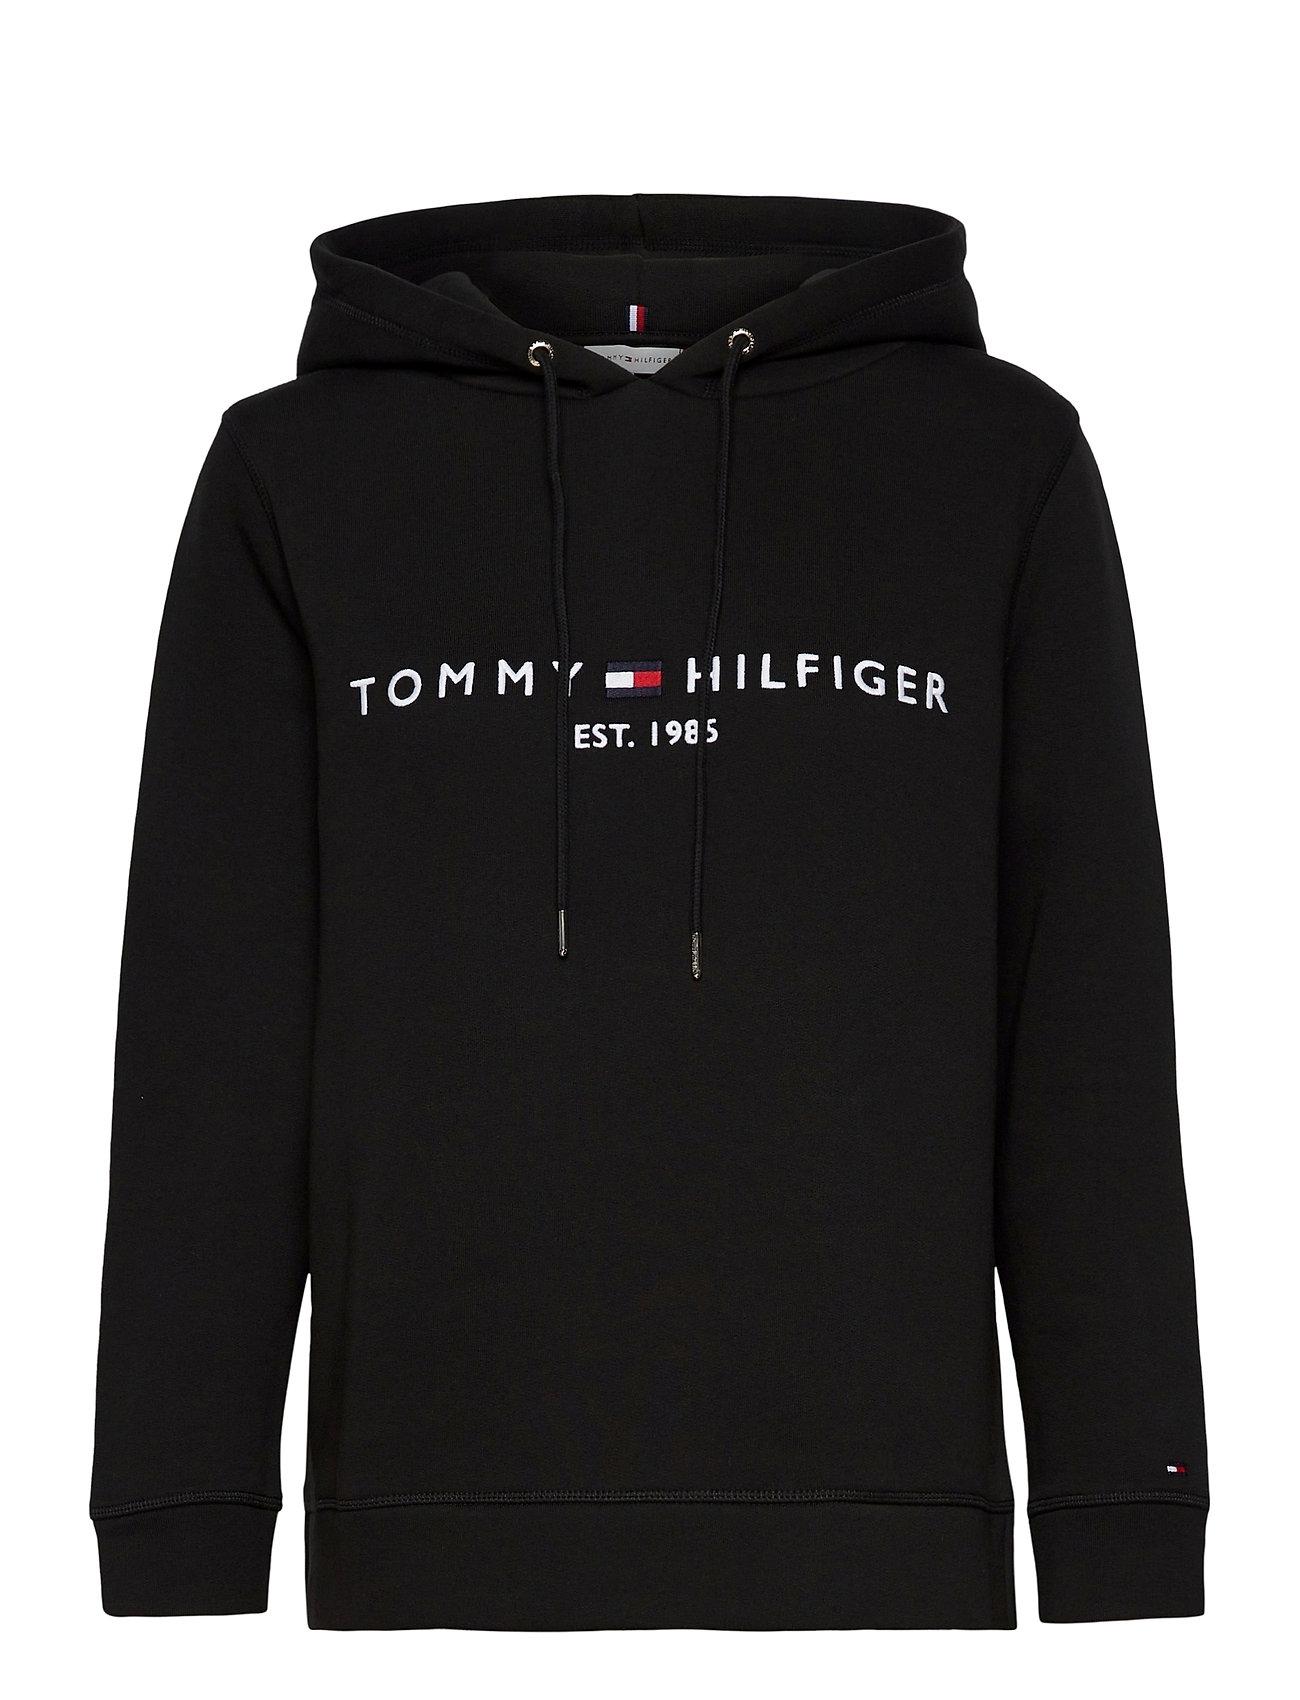 Tommy Hilfiger TH ESS HILFIGER HOOD - BLACK